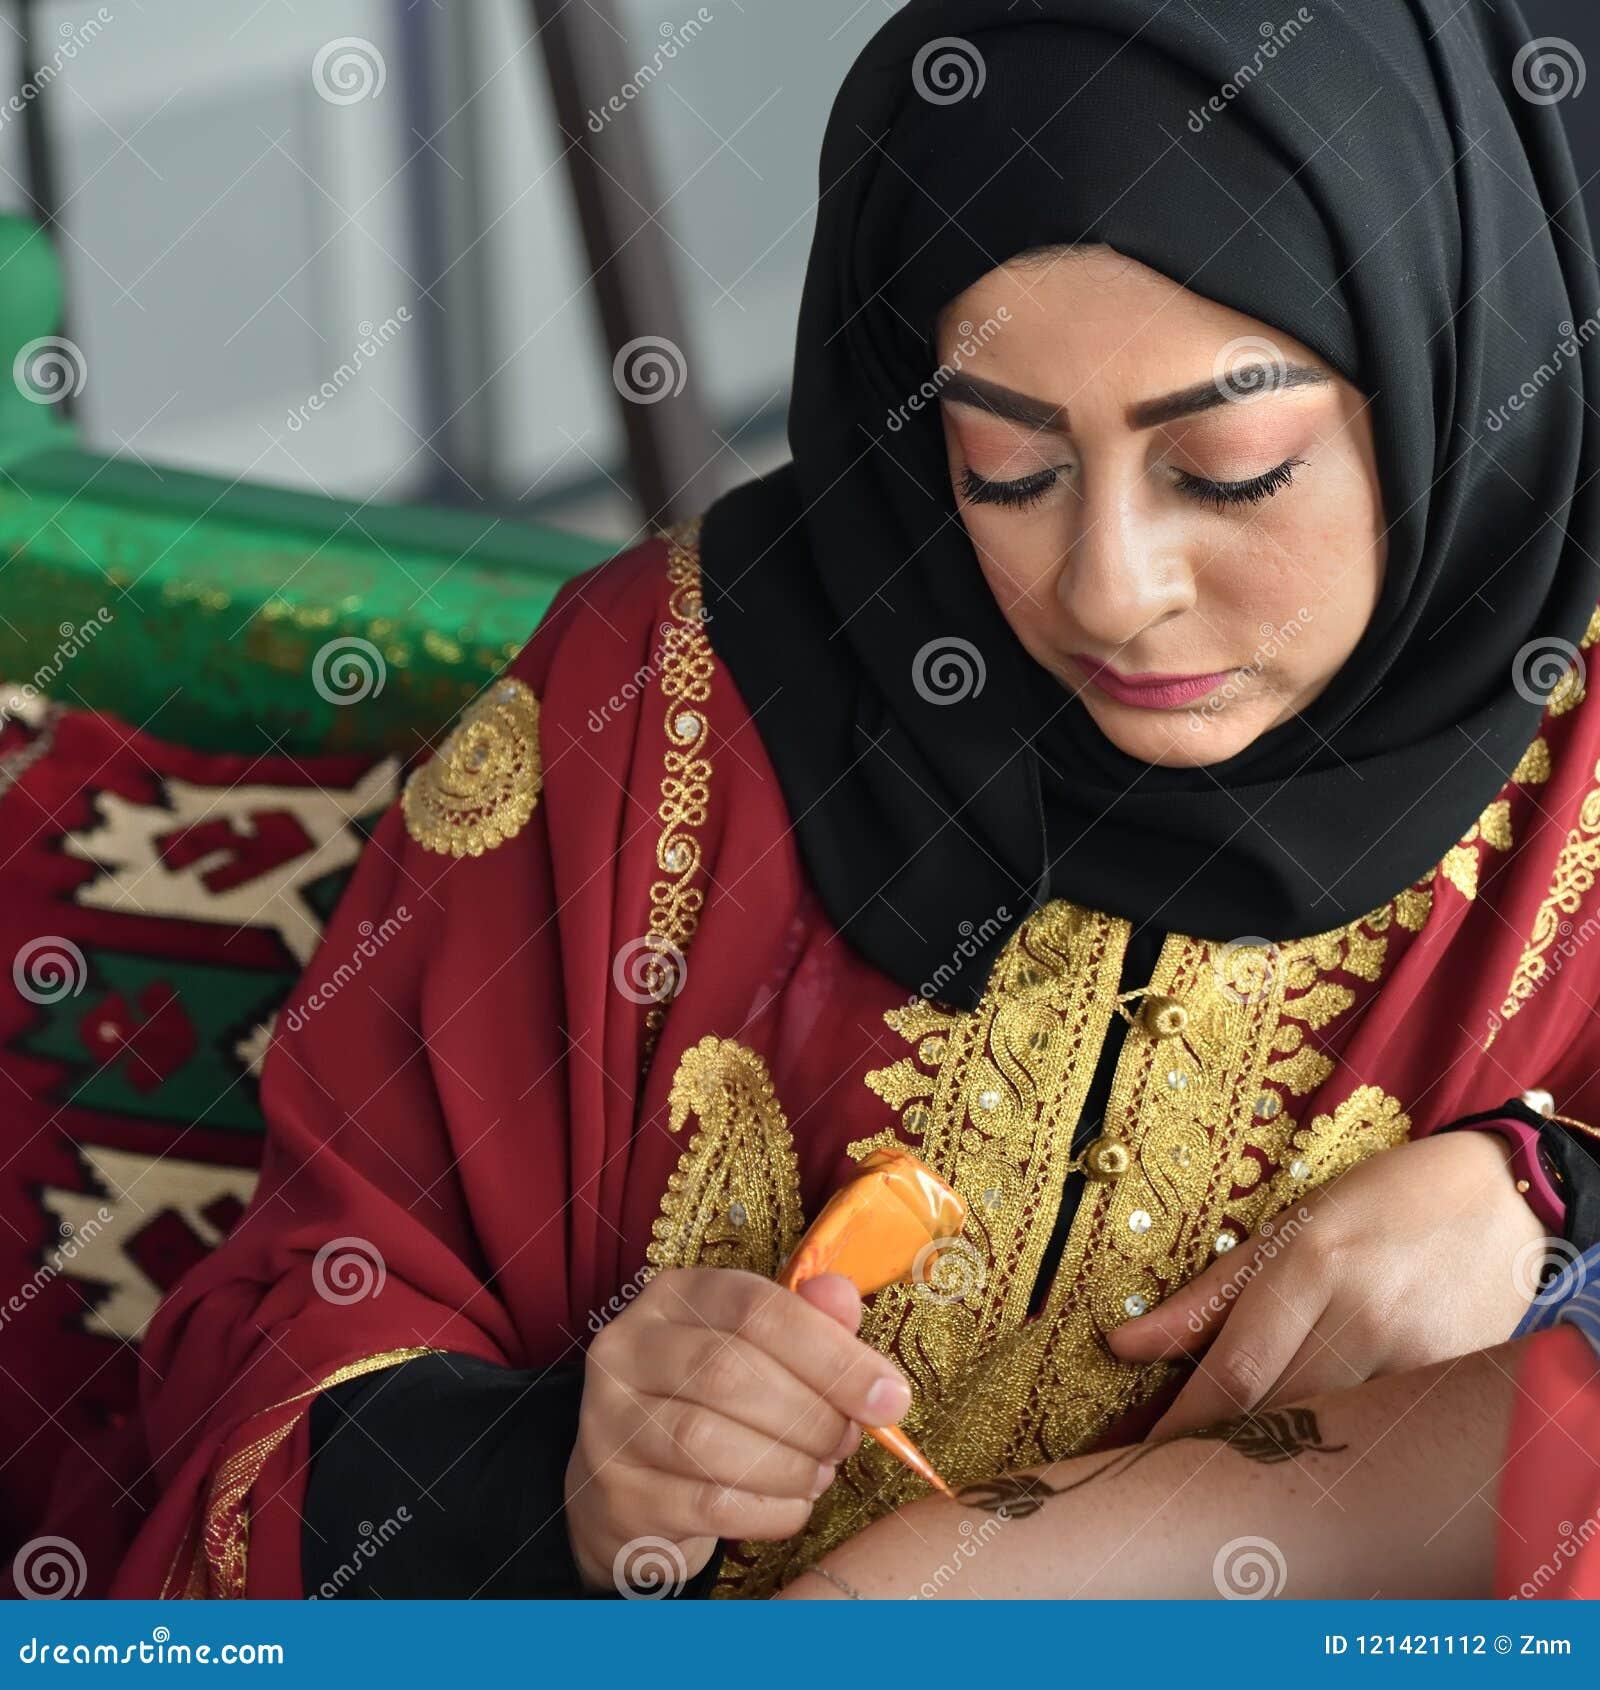 Mehndi Henna Tattoo A Henna Or Mehndi Applier At Work Editorial